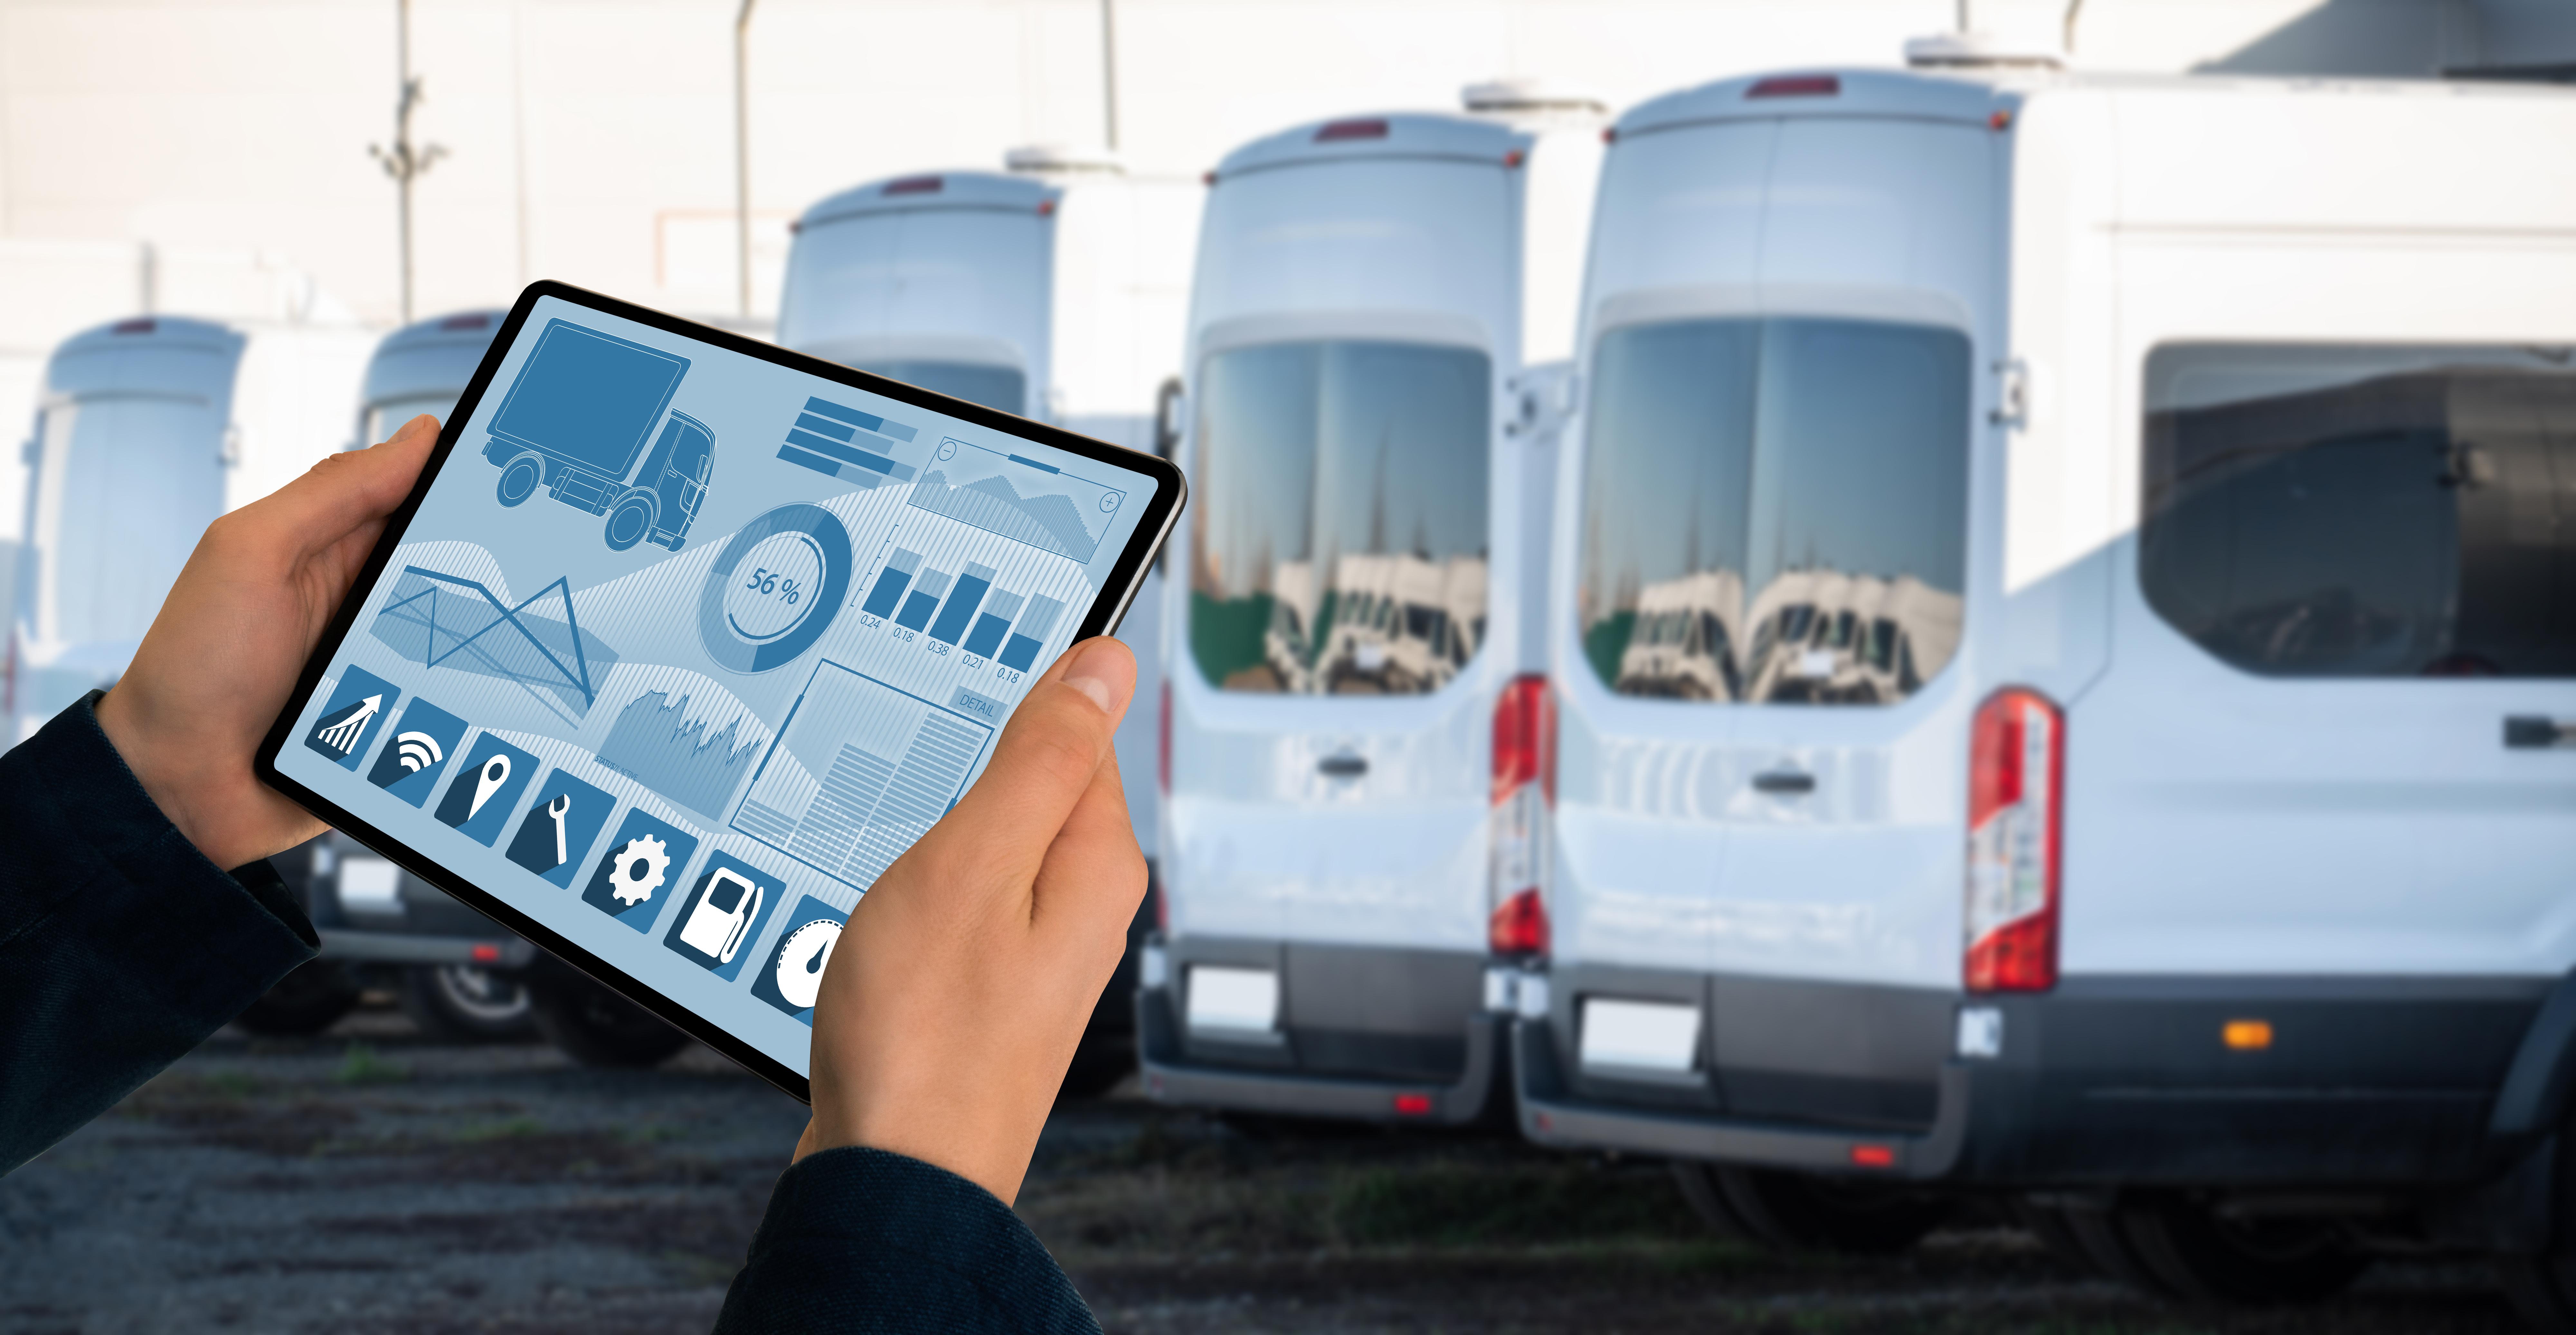 Fleet management, IOT, Wireless DNA, Automated efficiency